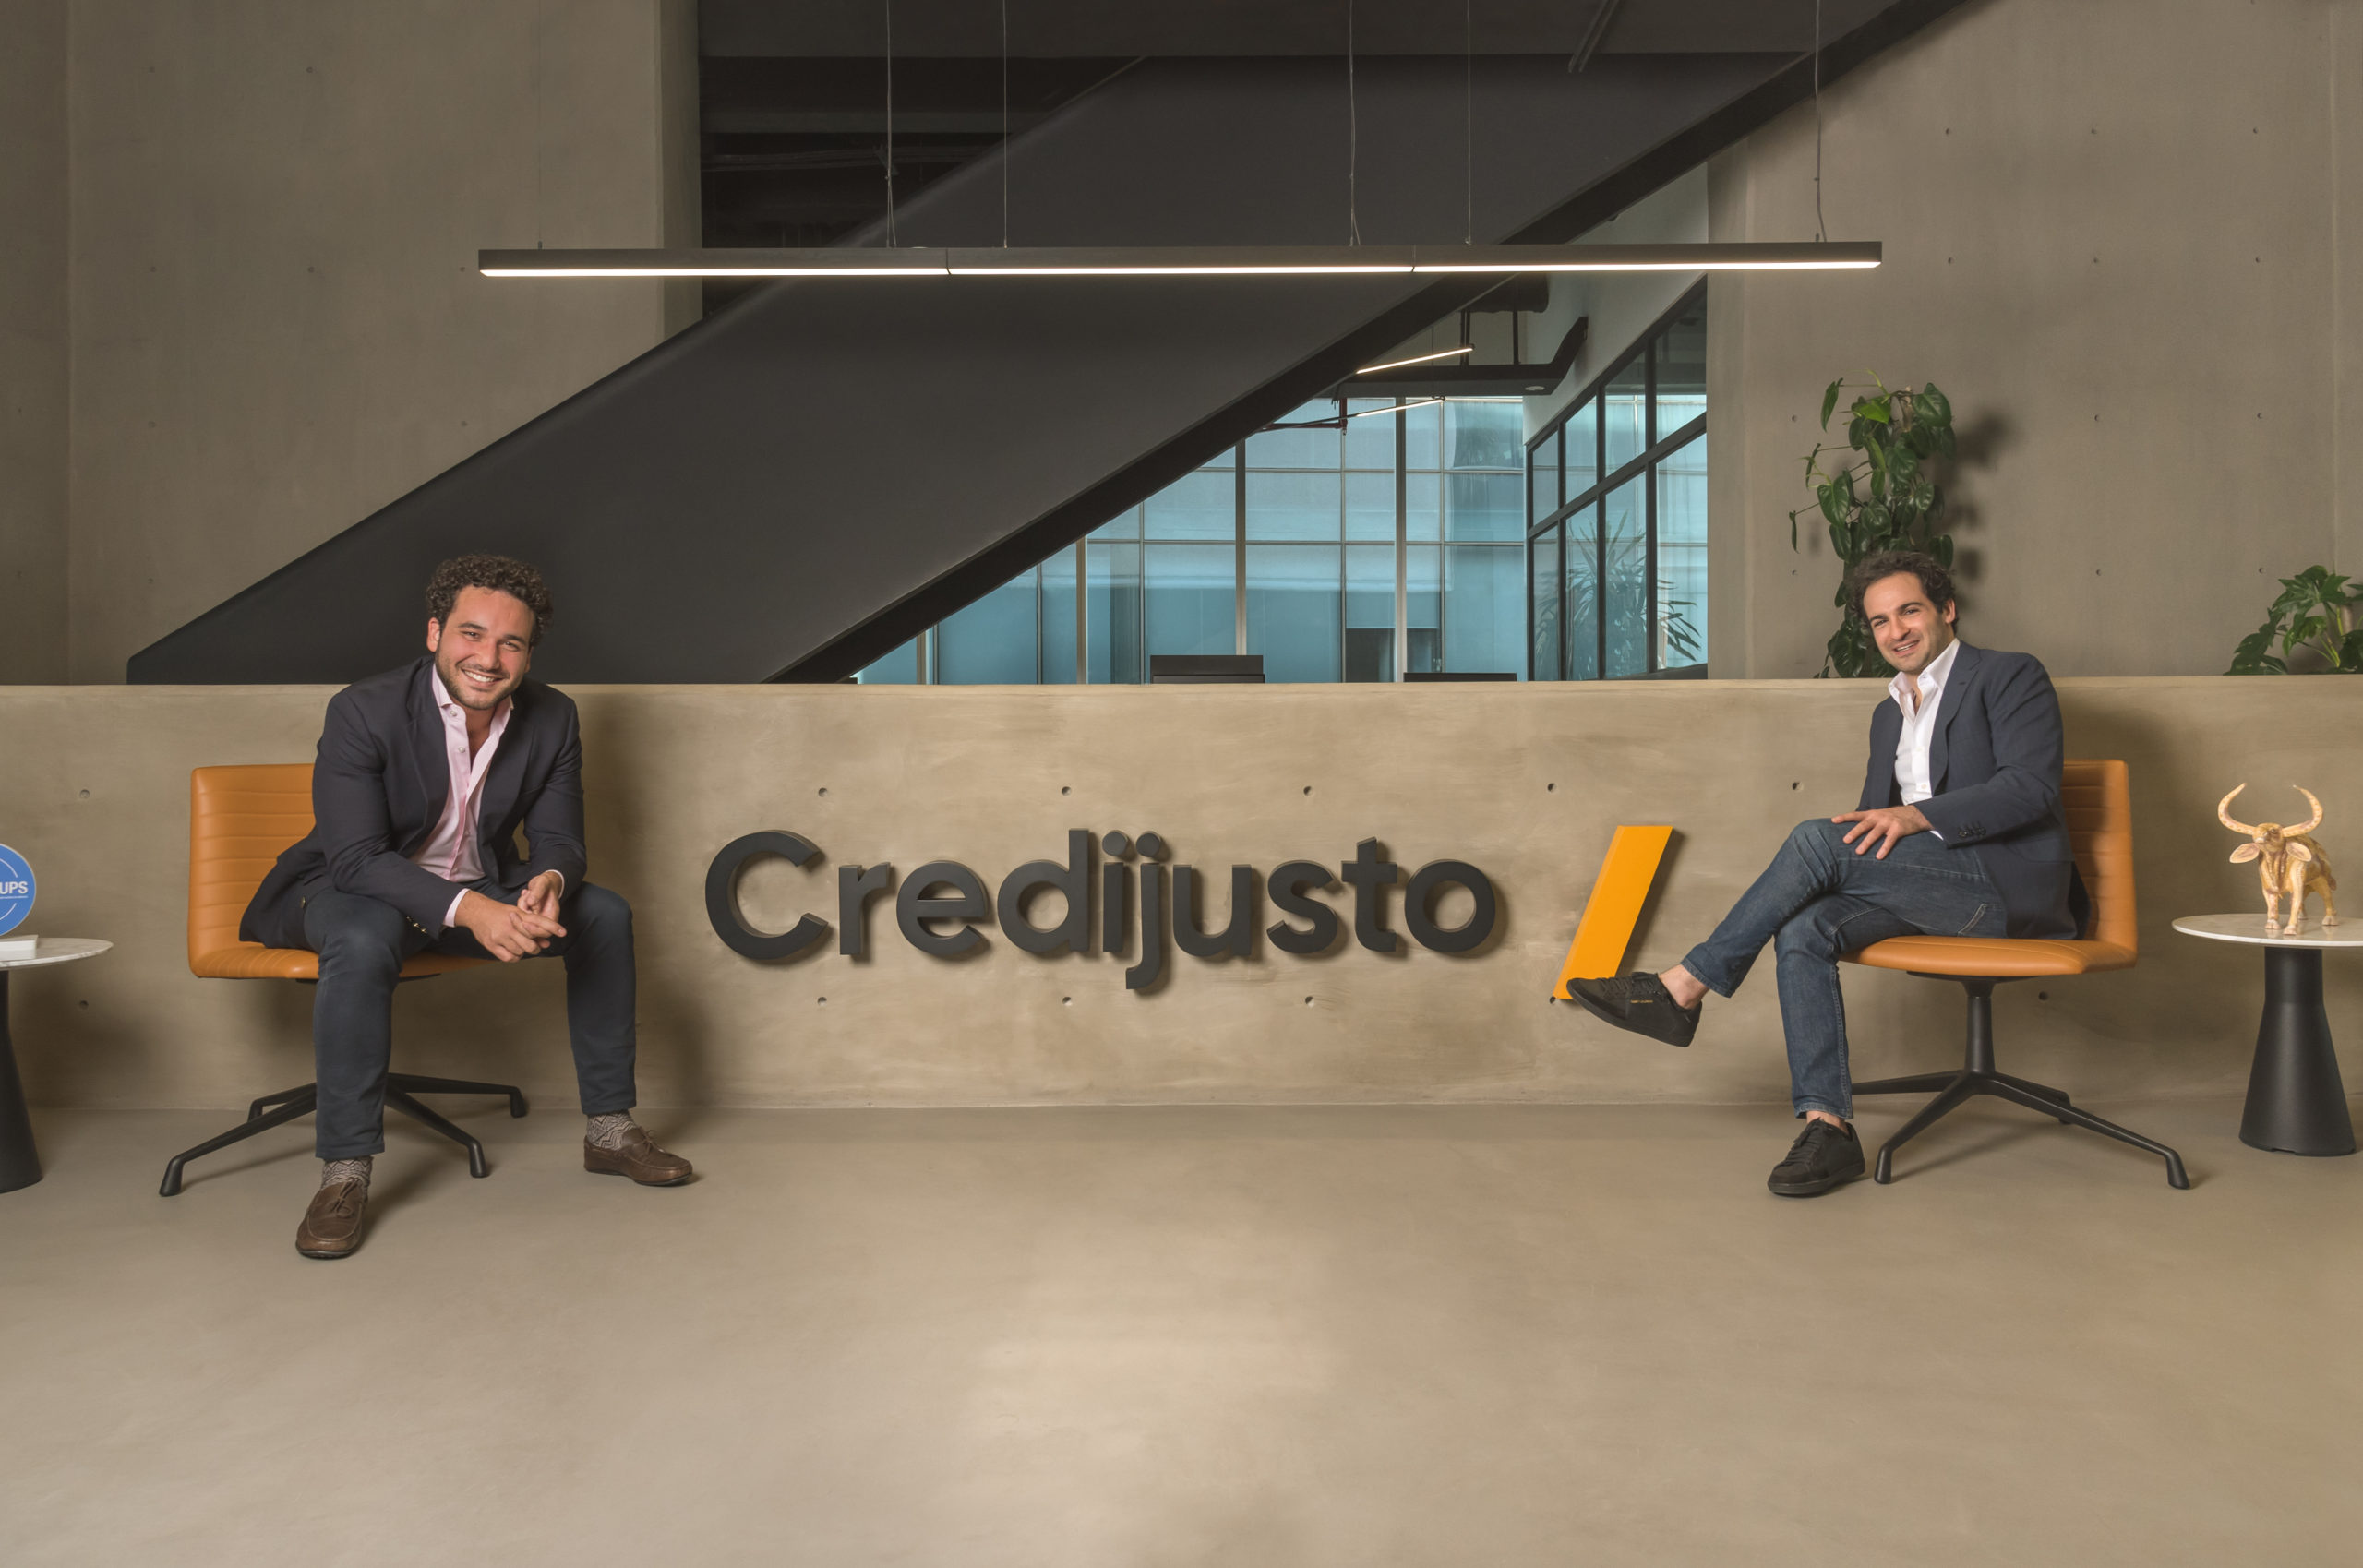 Credijusto adquirió Banco Finterra